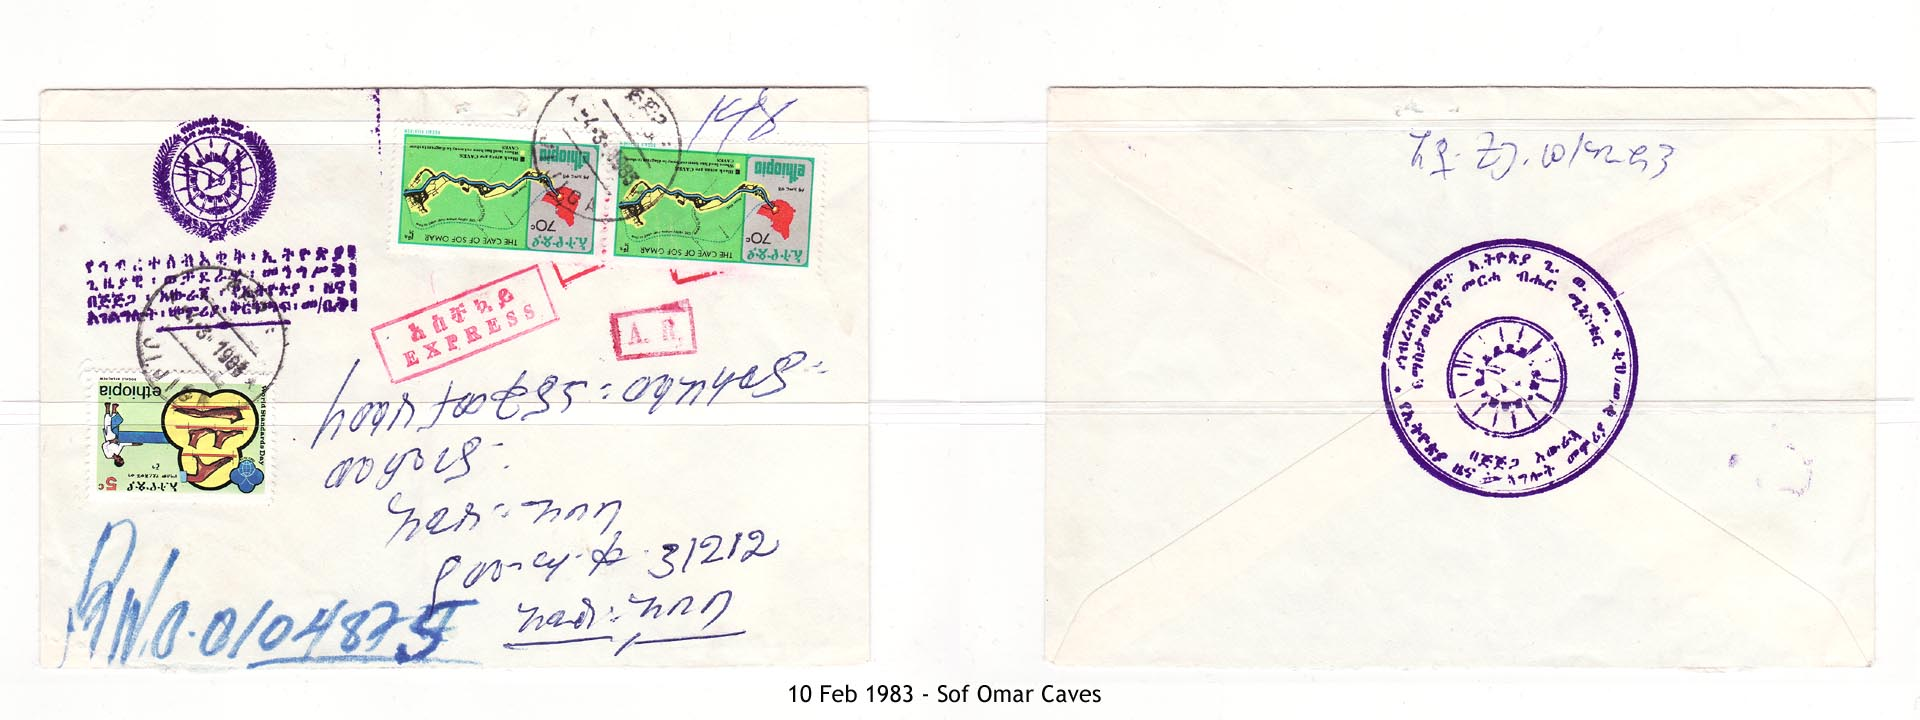 19830210 - Sof Omar Caves